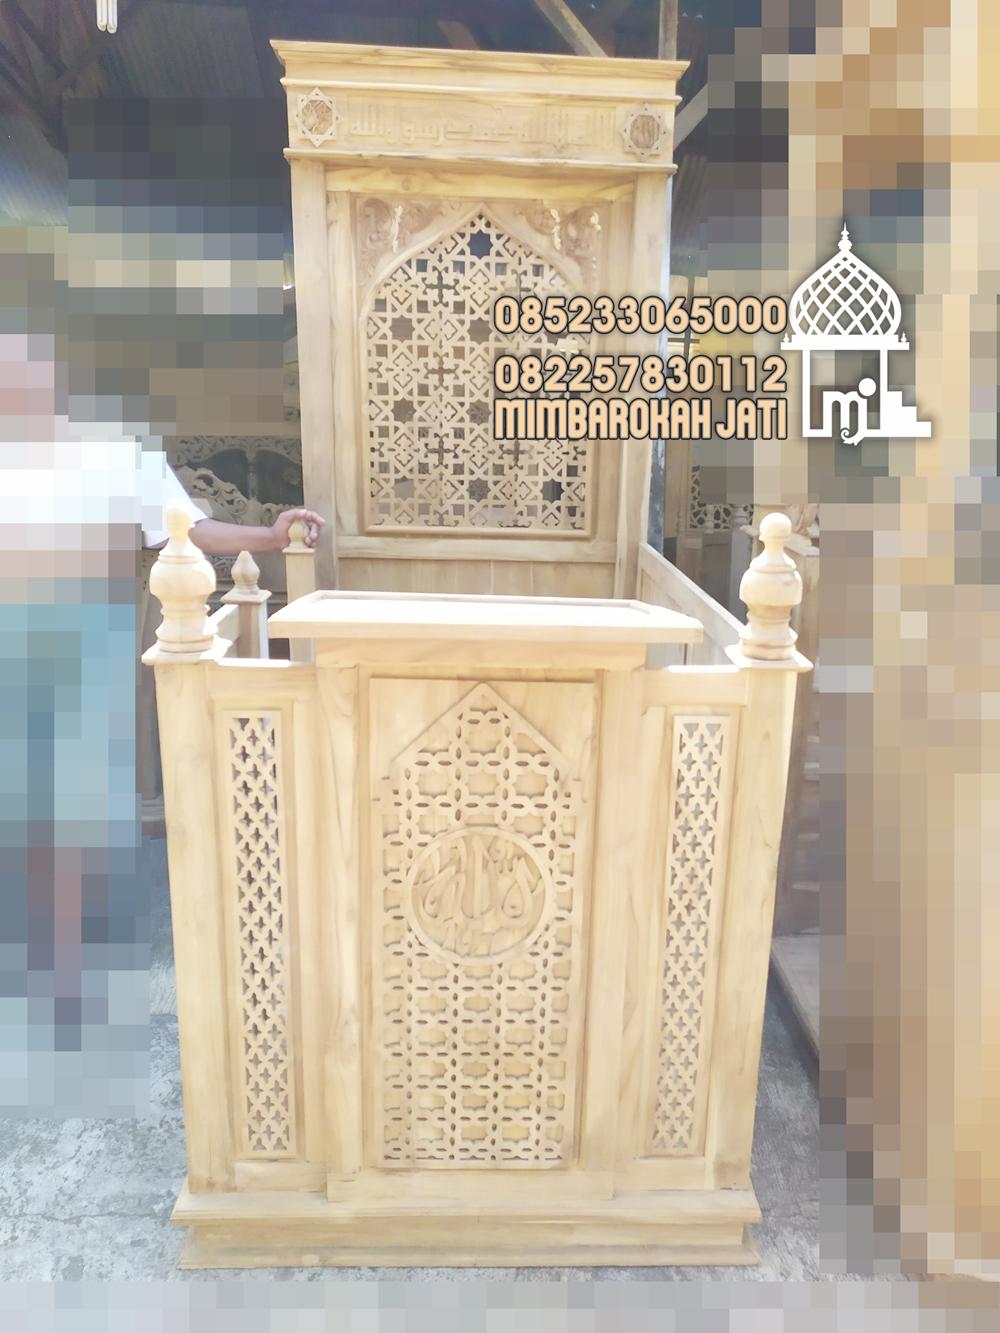 Mimbar Jepara Ornamen Marocco Masjid Agung Ngasem